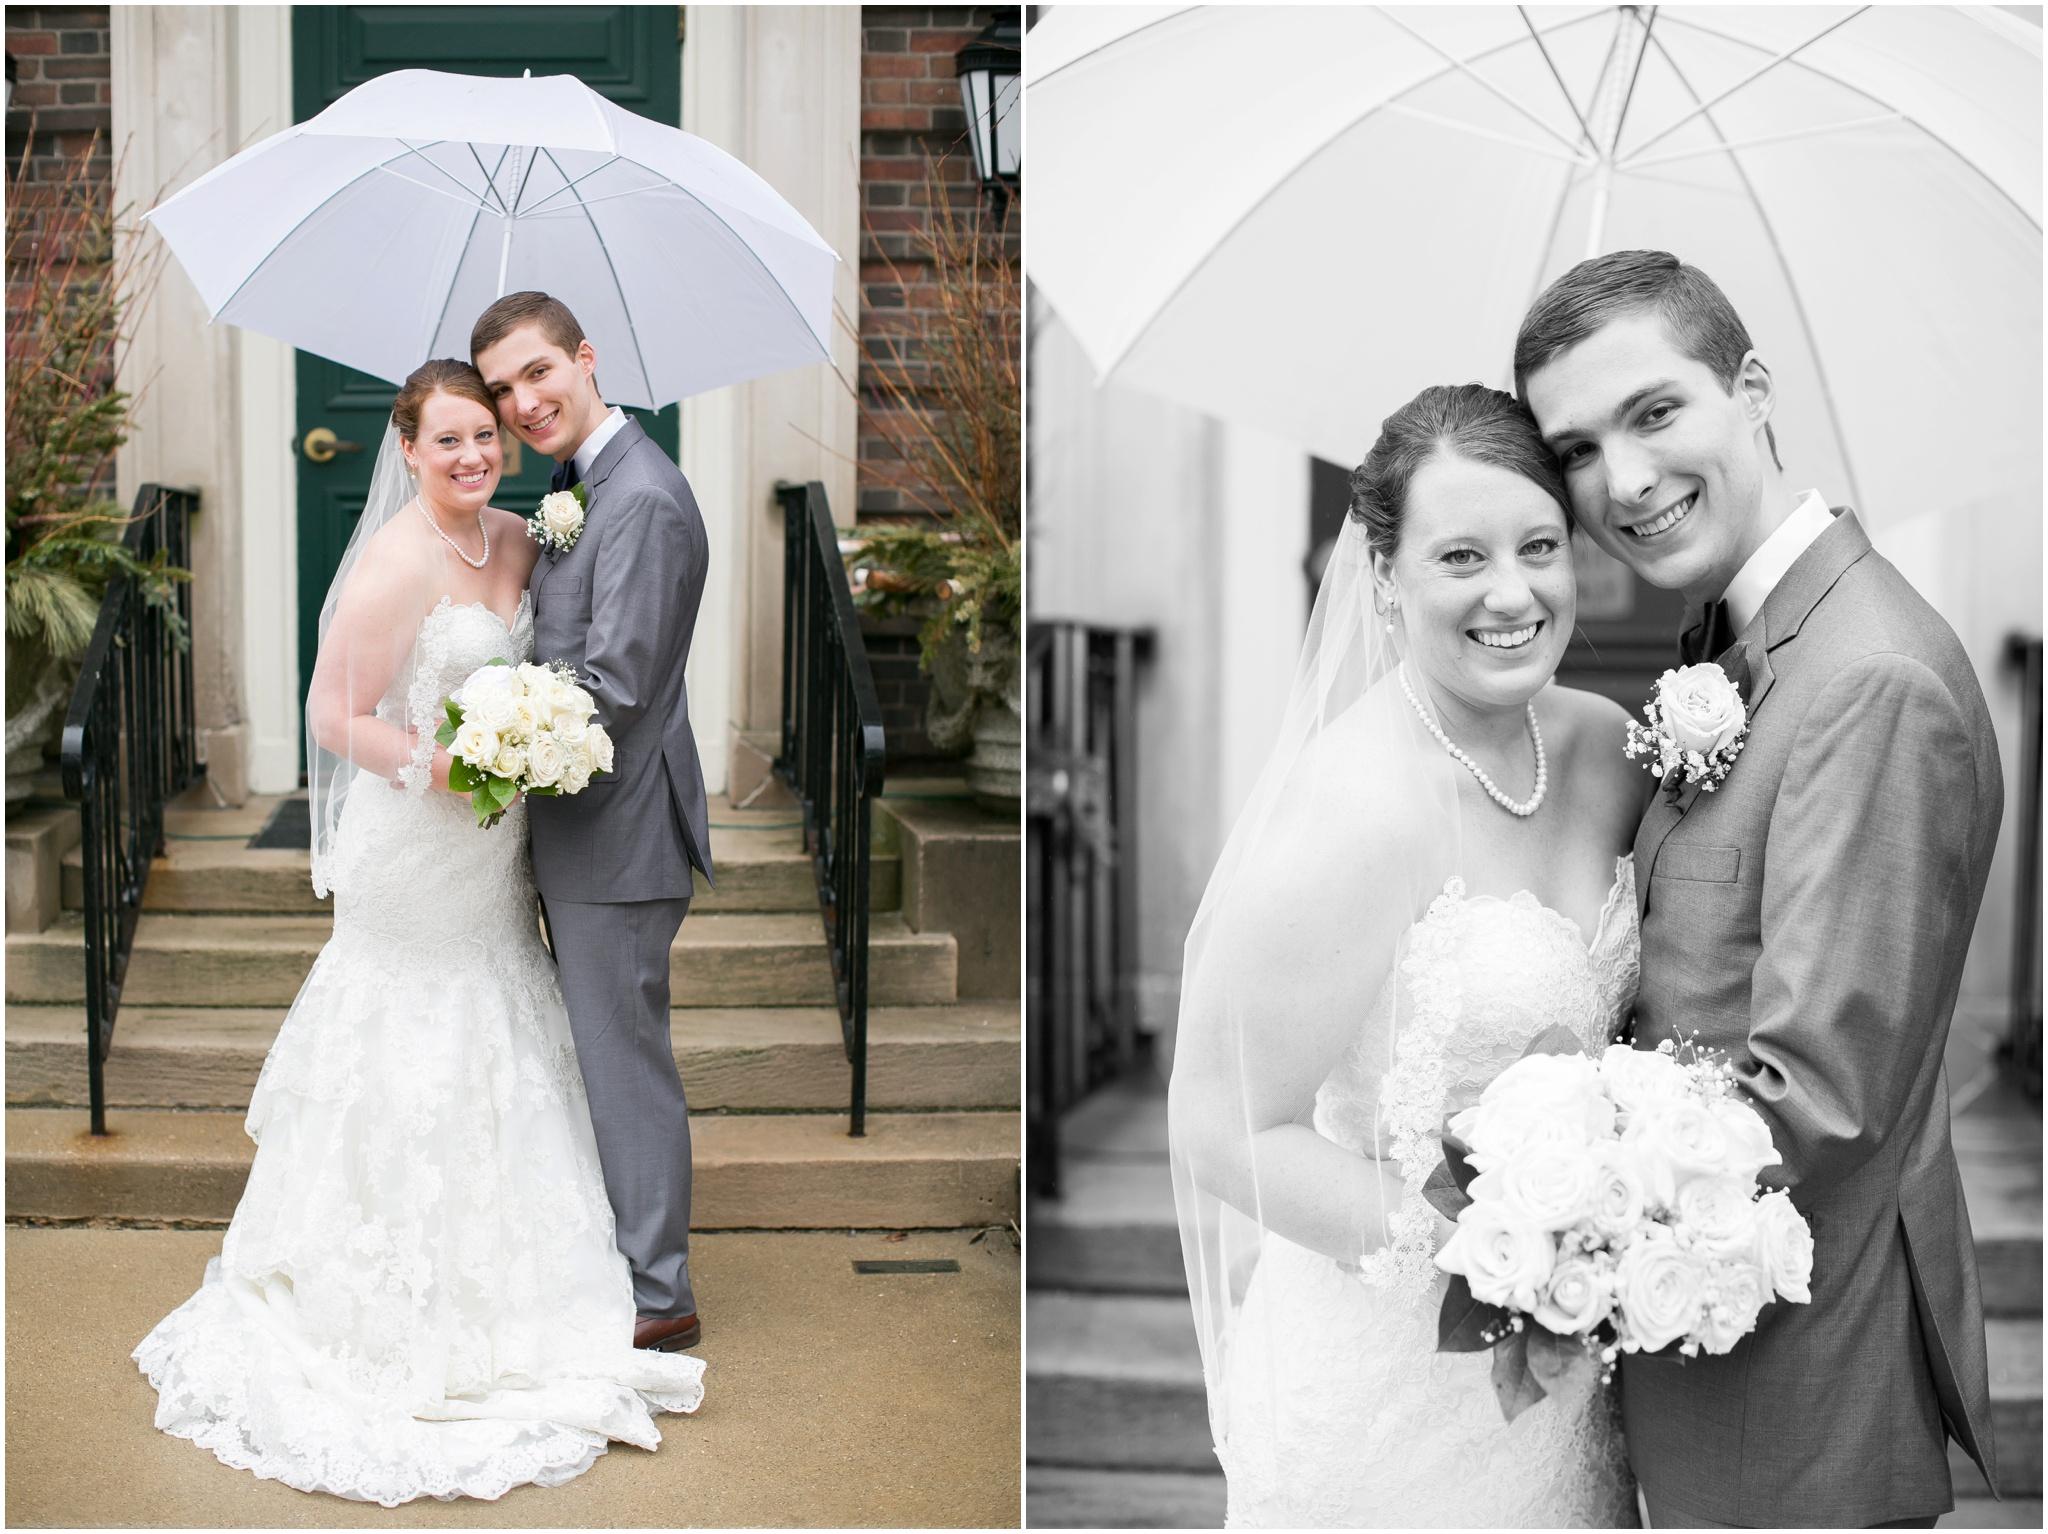 Madison_Club_Madison_Wisconsin_Wedding_Photographer_Spring_Rainy_Wedding_2632.jpg